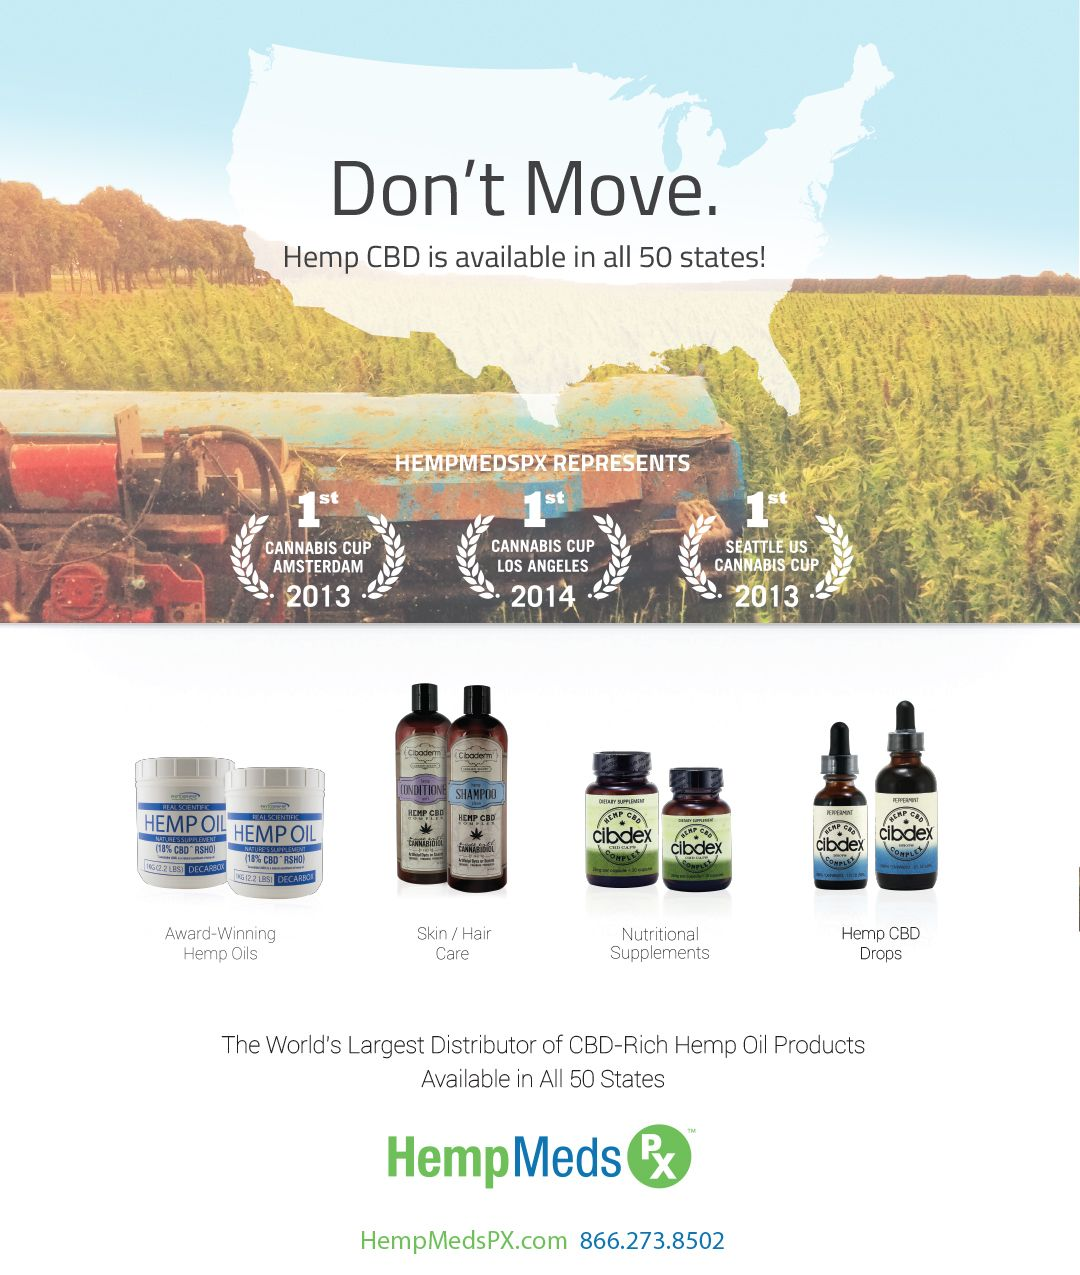 Medical Marijuana Inc.'s HempMedsPX Launches DON'T MOVE Awareness Campaign